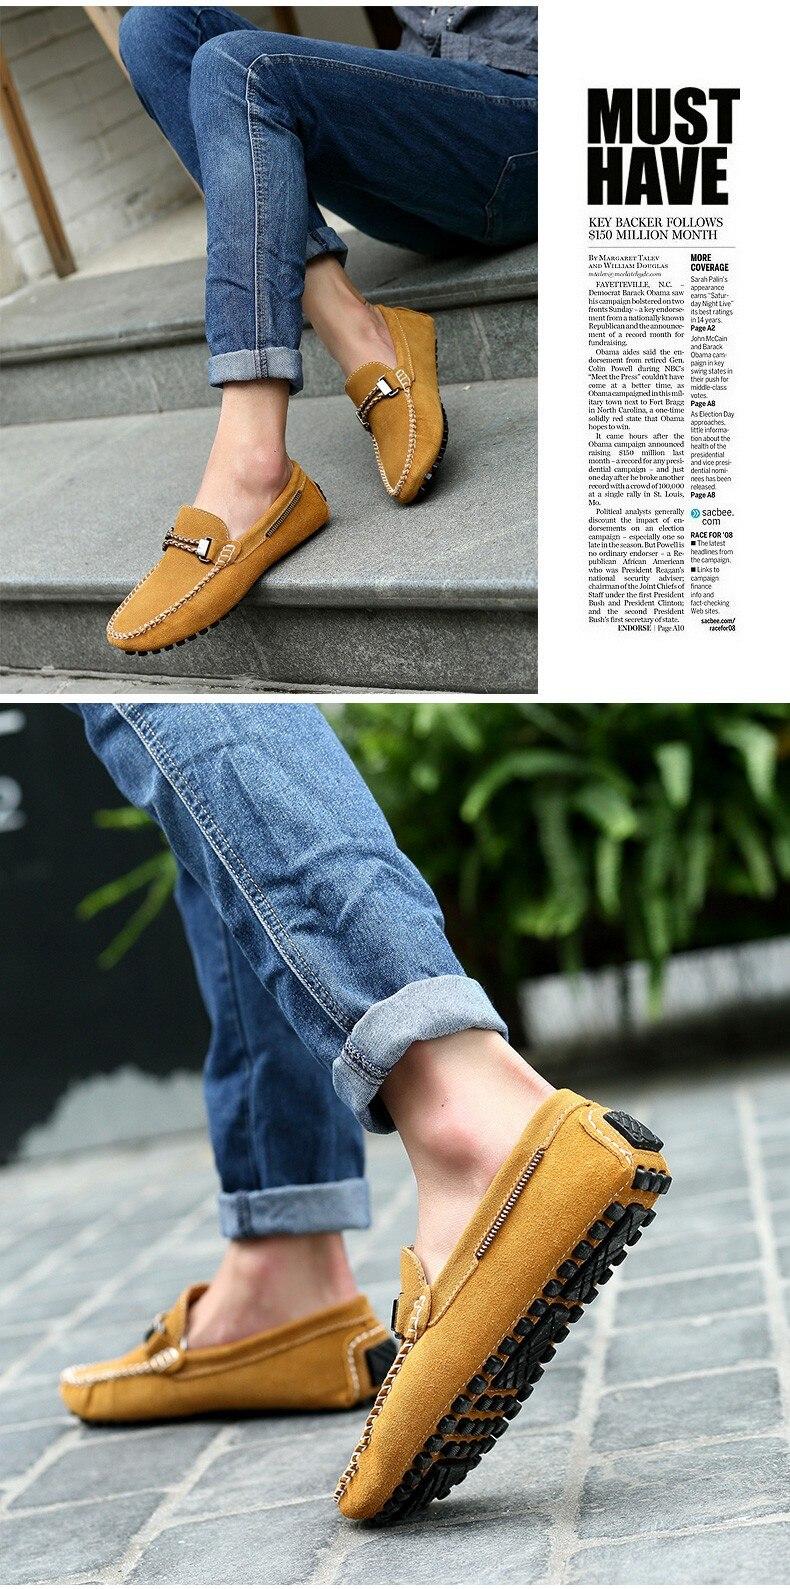 Shoe fashion fayetteville nc 45